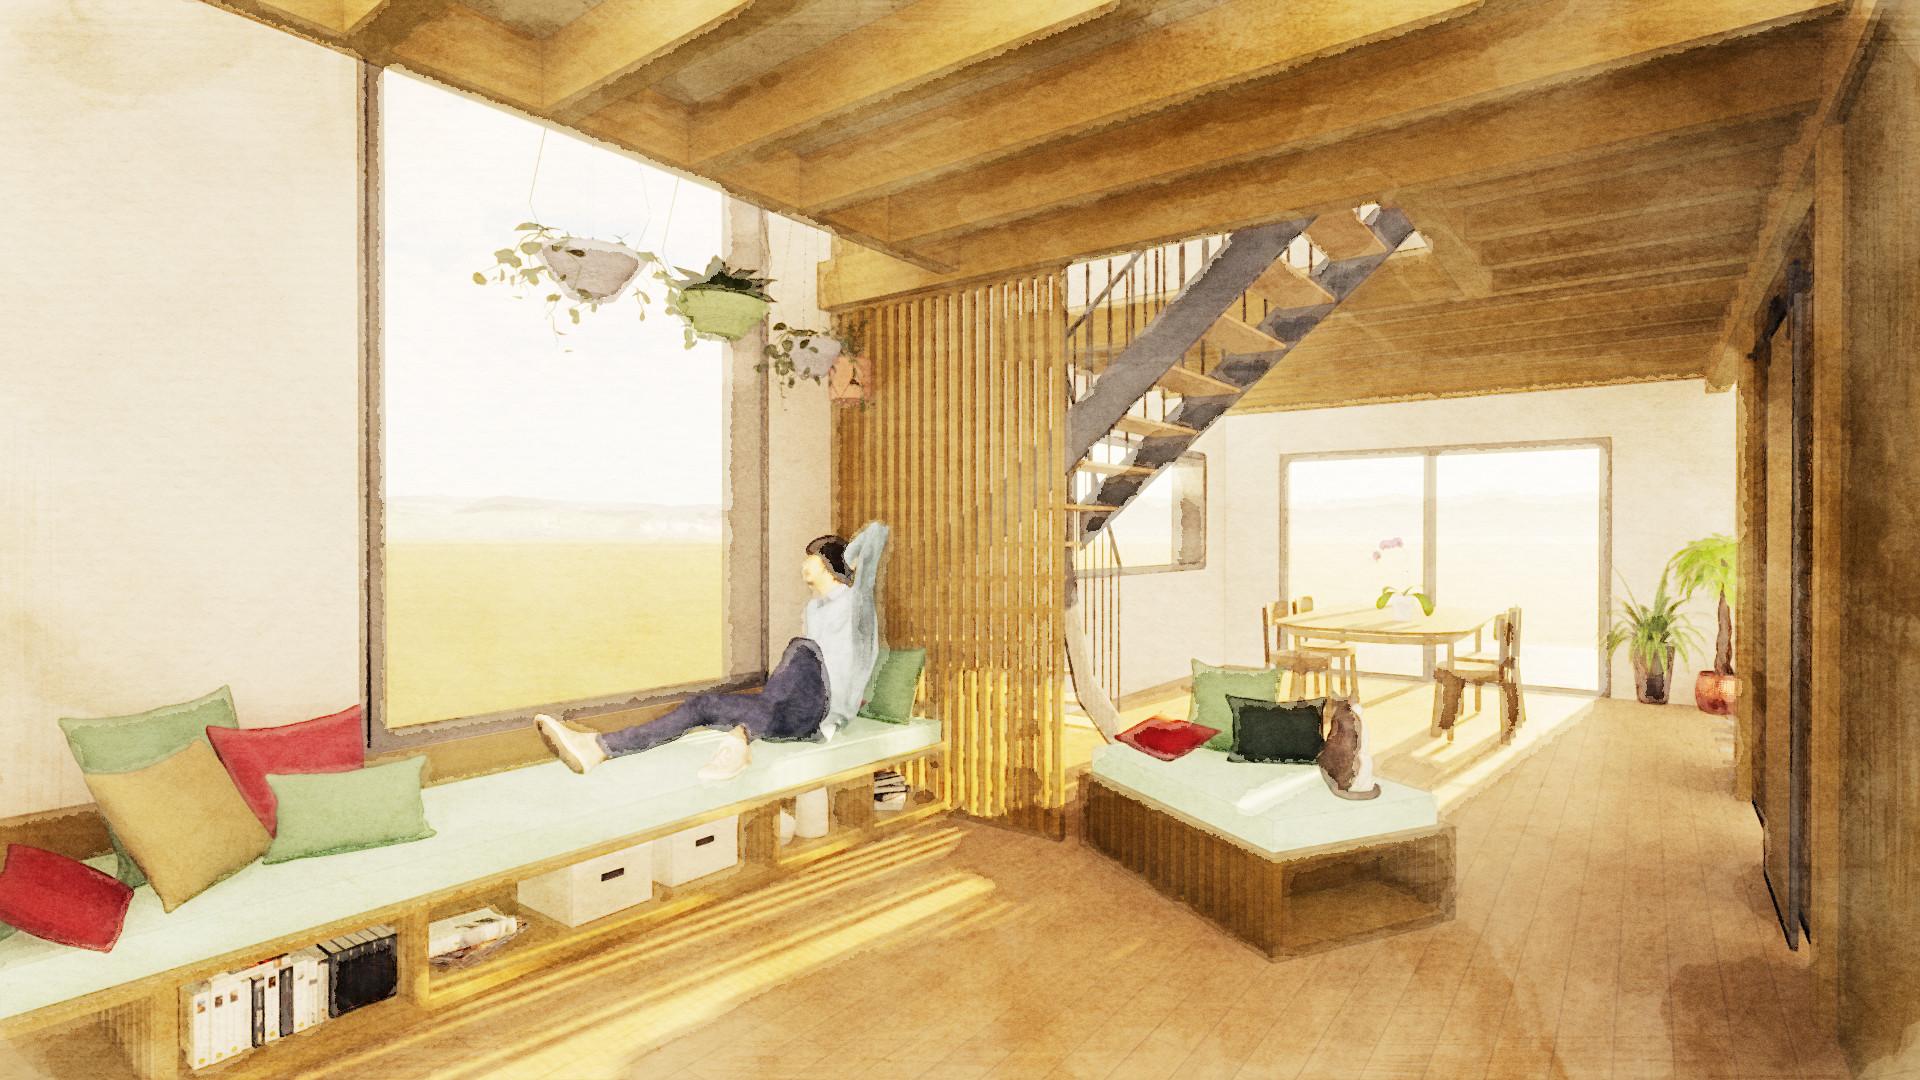 Hirundo-Architecture_Projet B&R_02.jpg